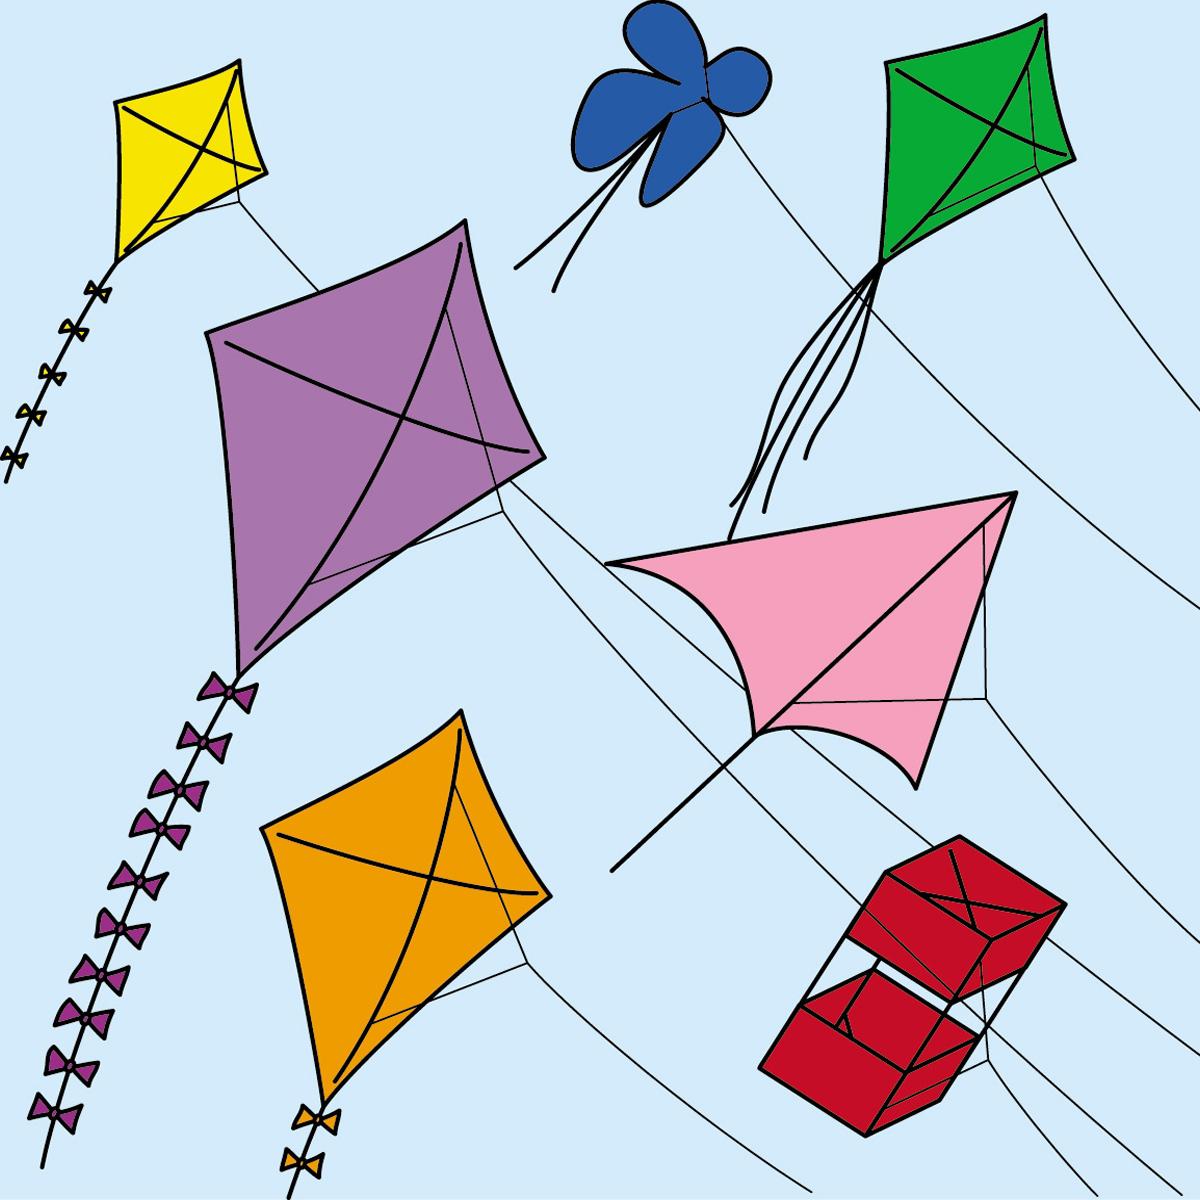 Gc5nern Kite Flying On International Gc Day Event